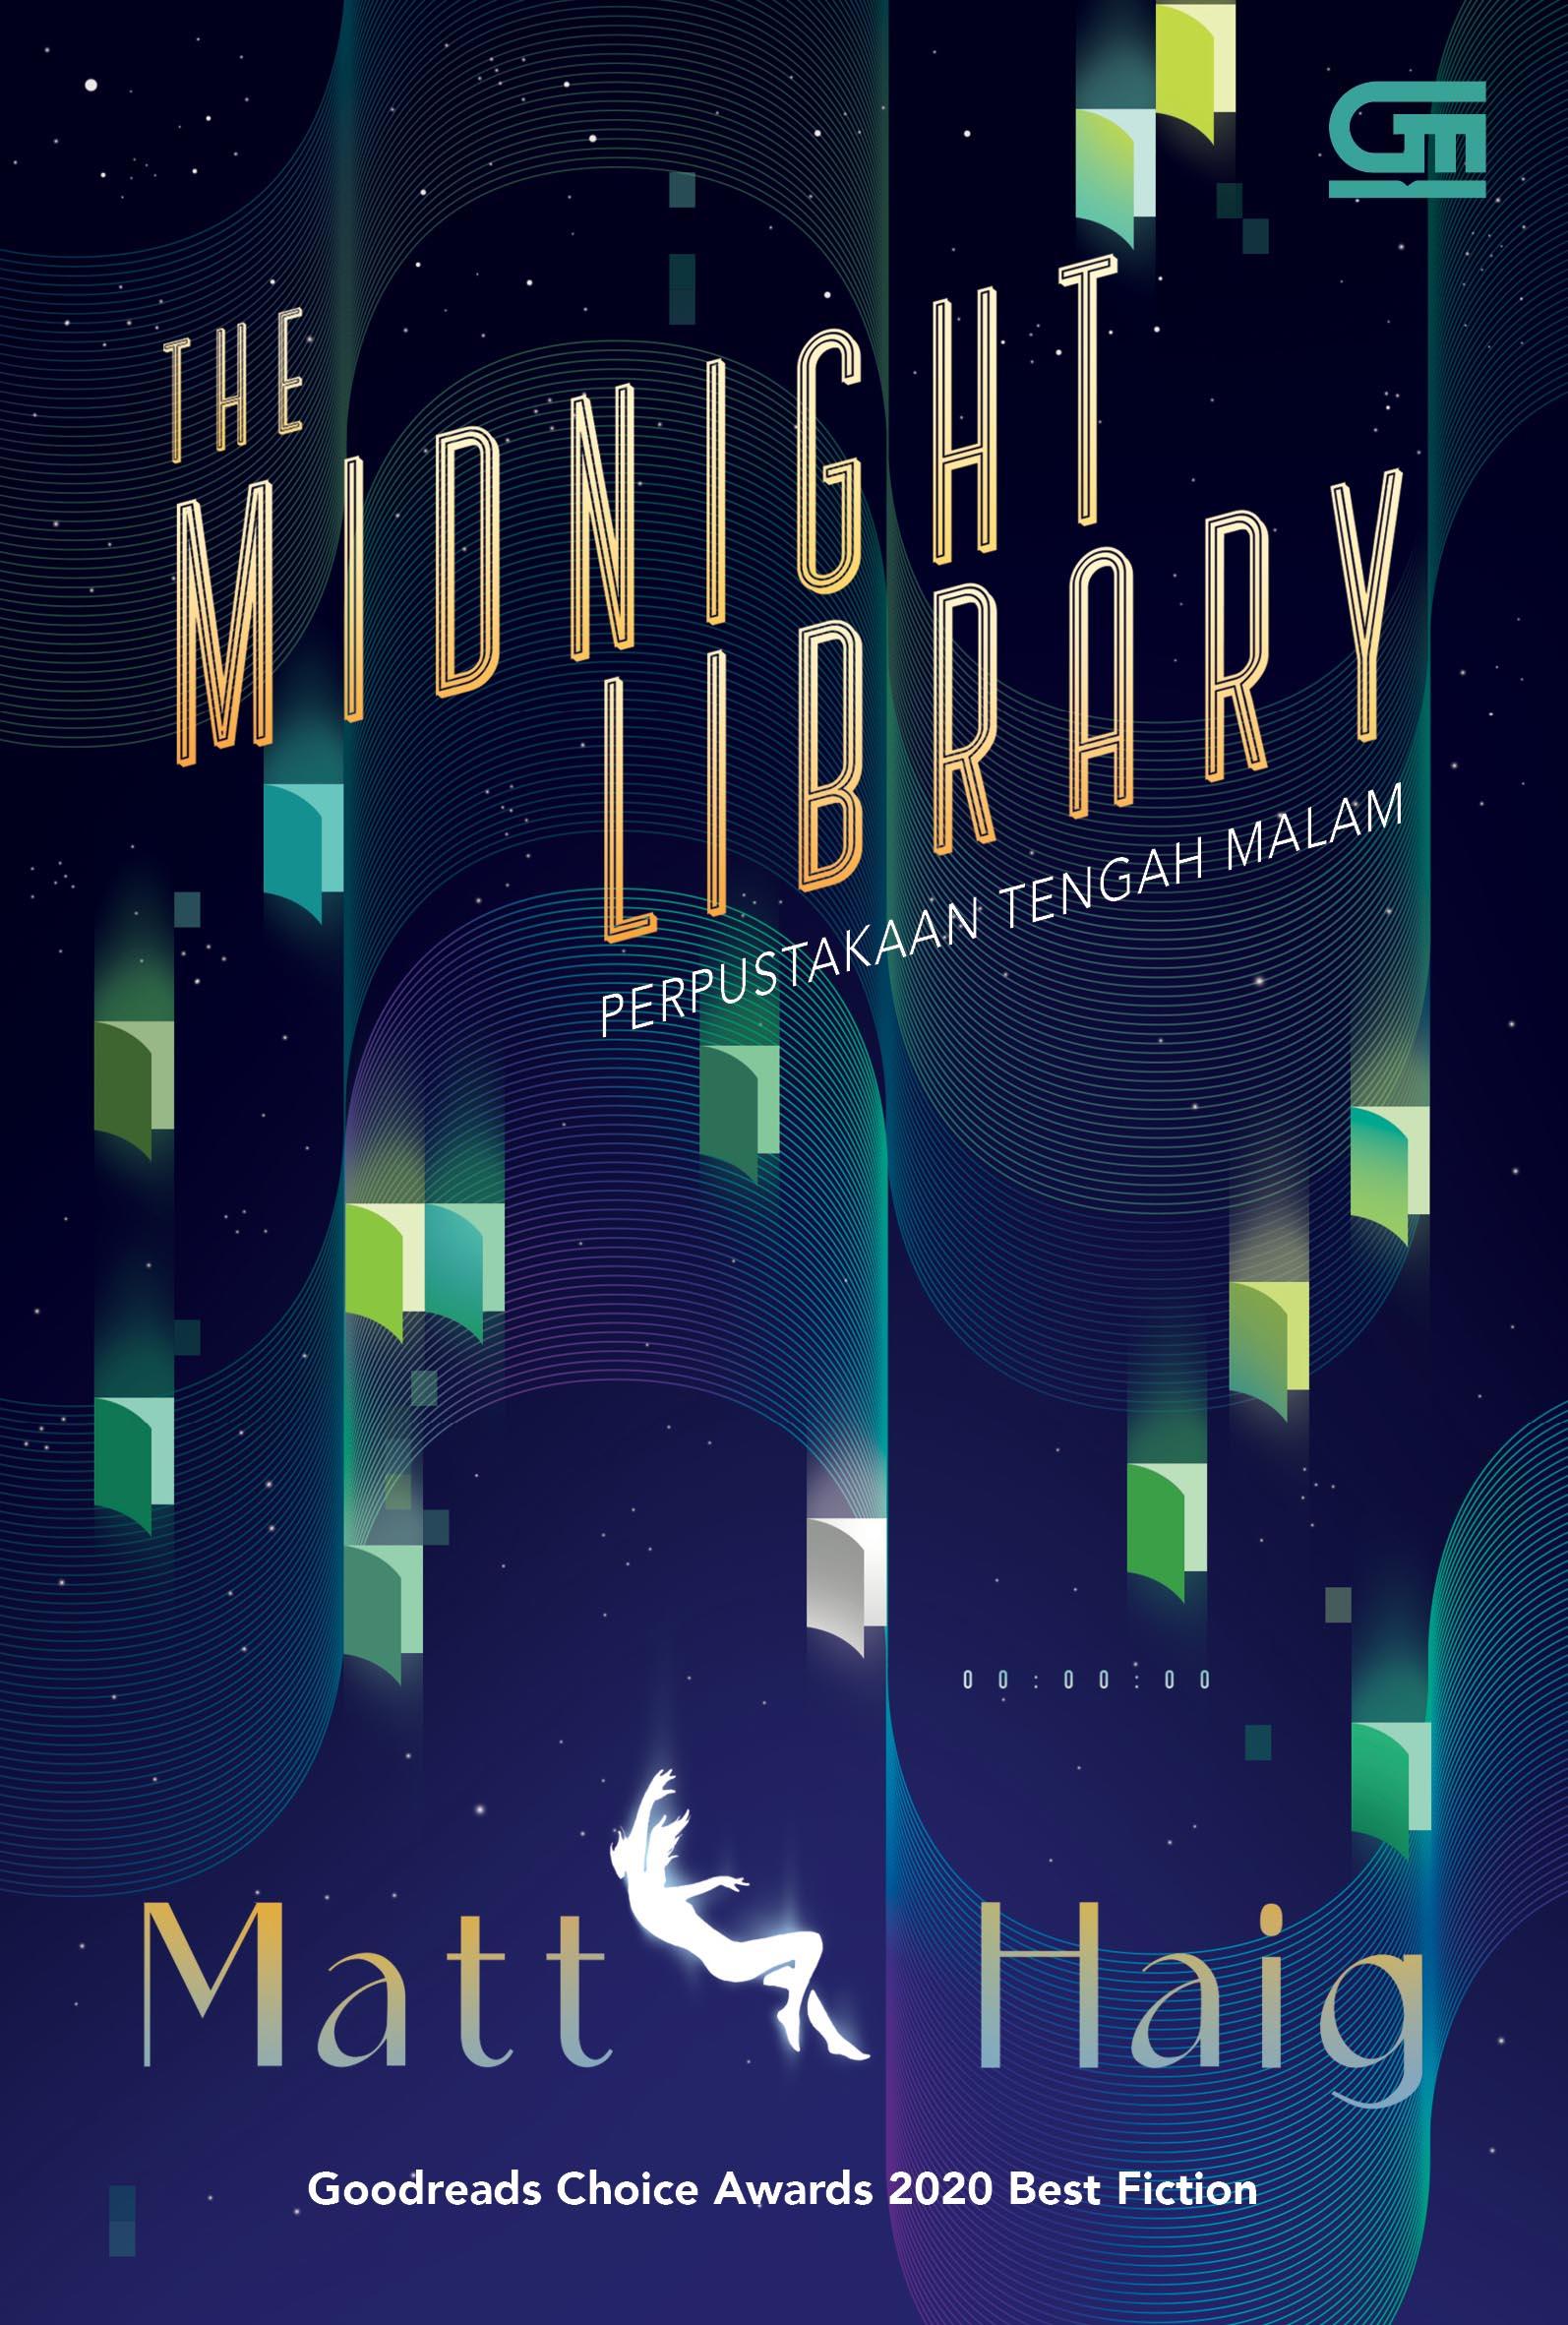 Perpustakaan Tengah Malam (Midnight Library)